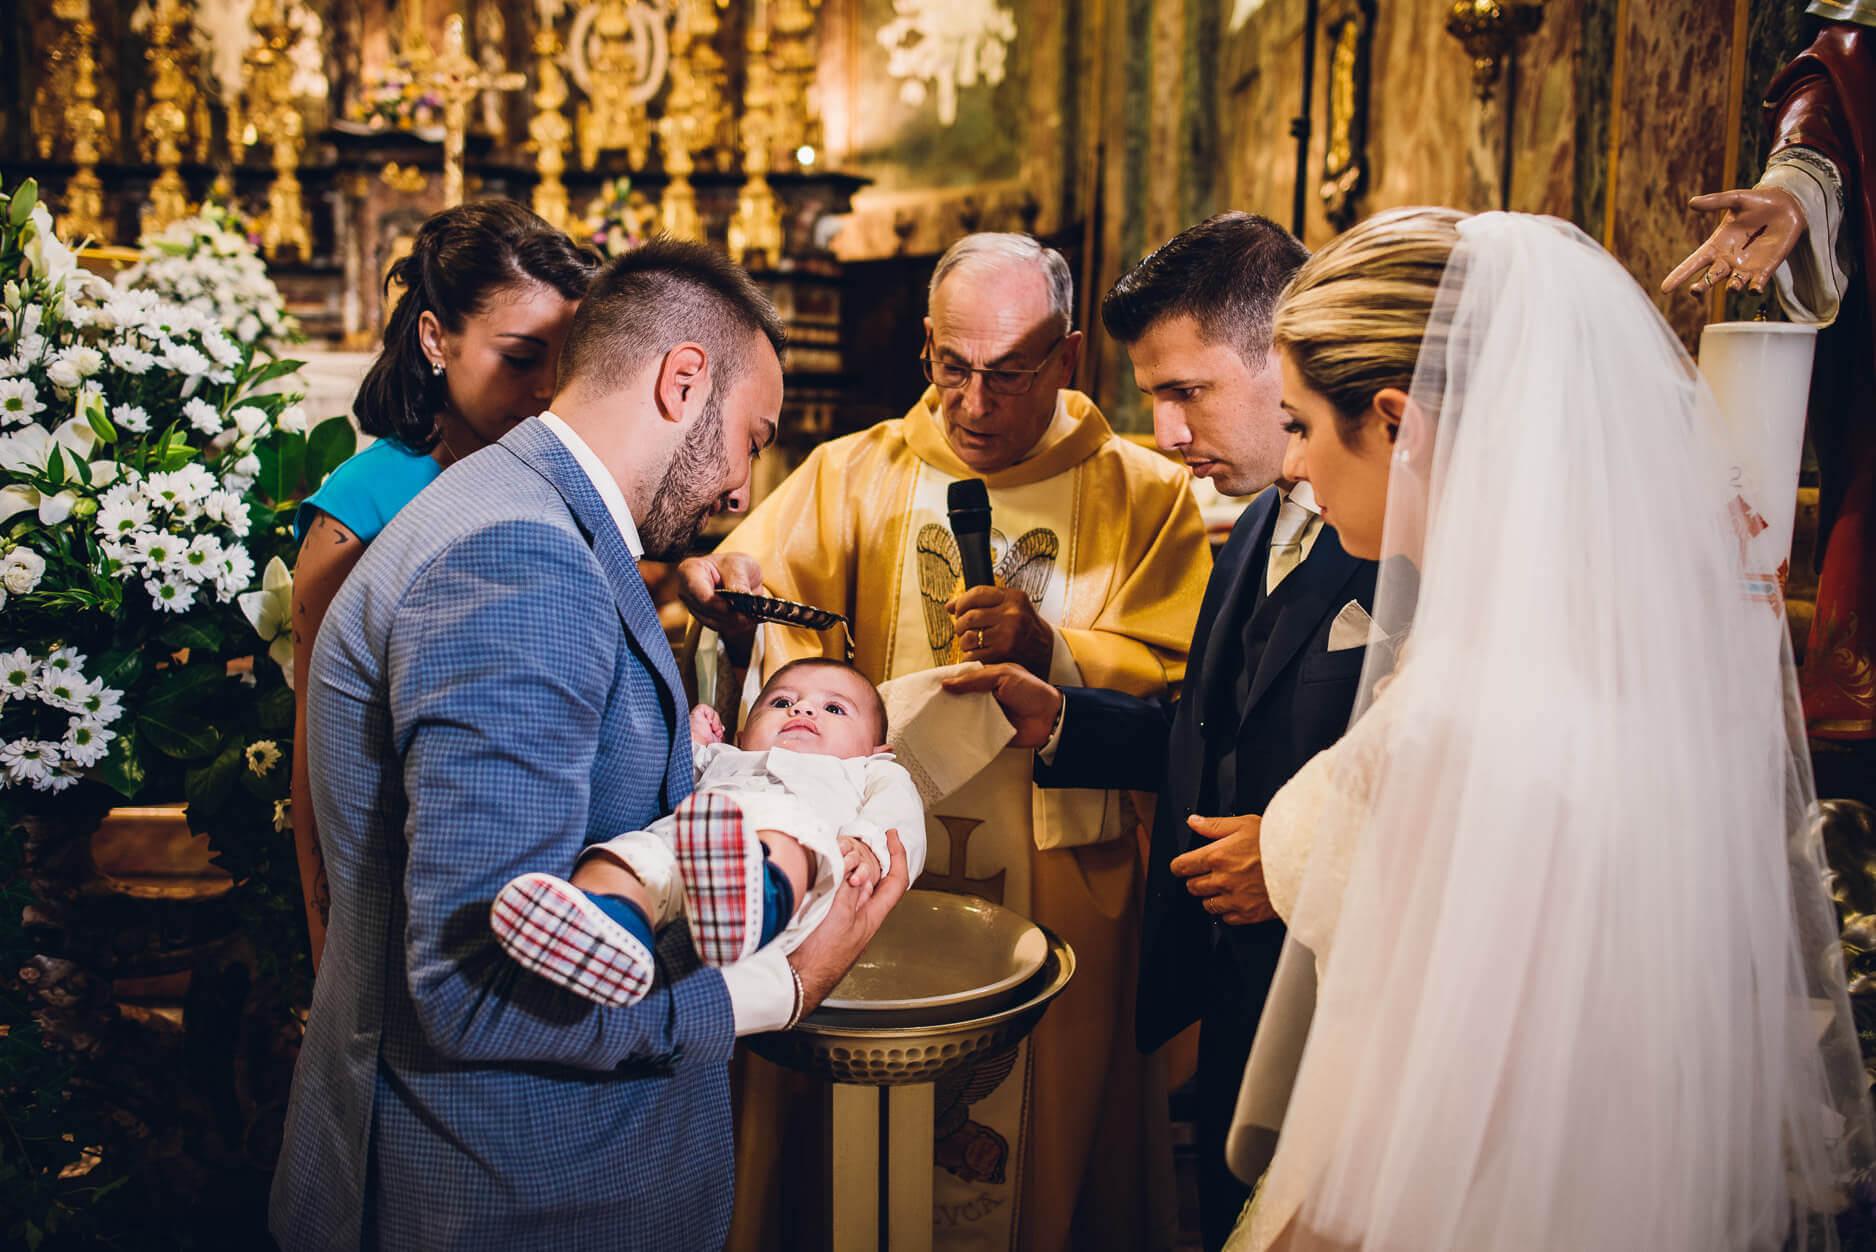 Frasi Matrimonio E Battesimo.Matrimonio E Battesimo Insieme Si Puo Fare Joyphotographers